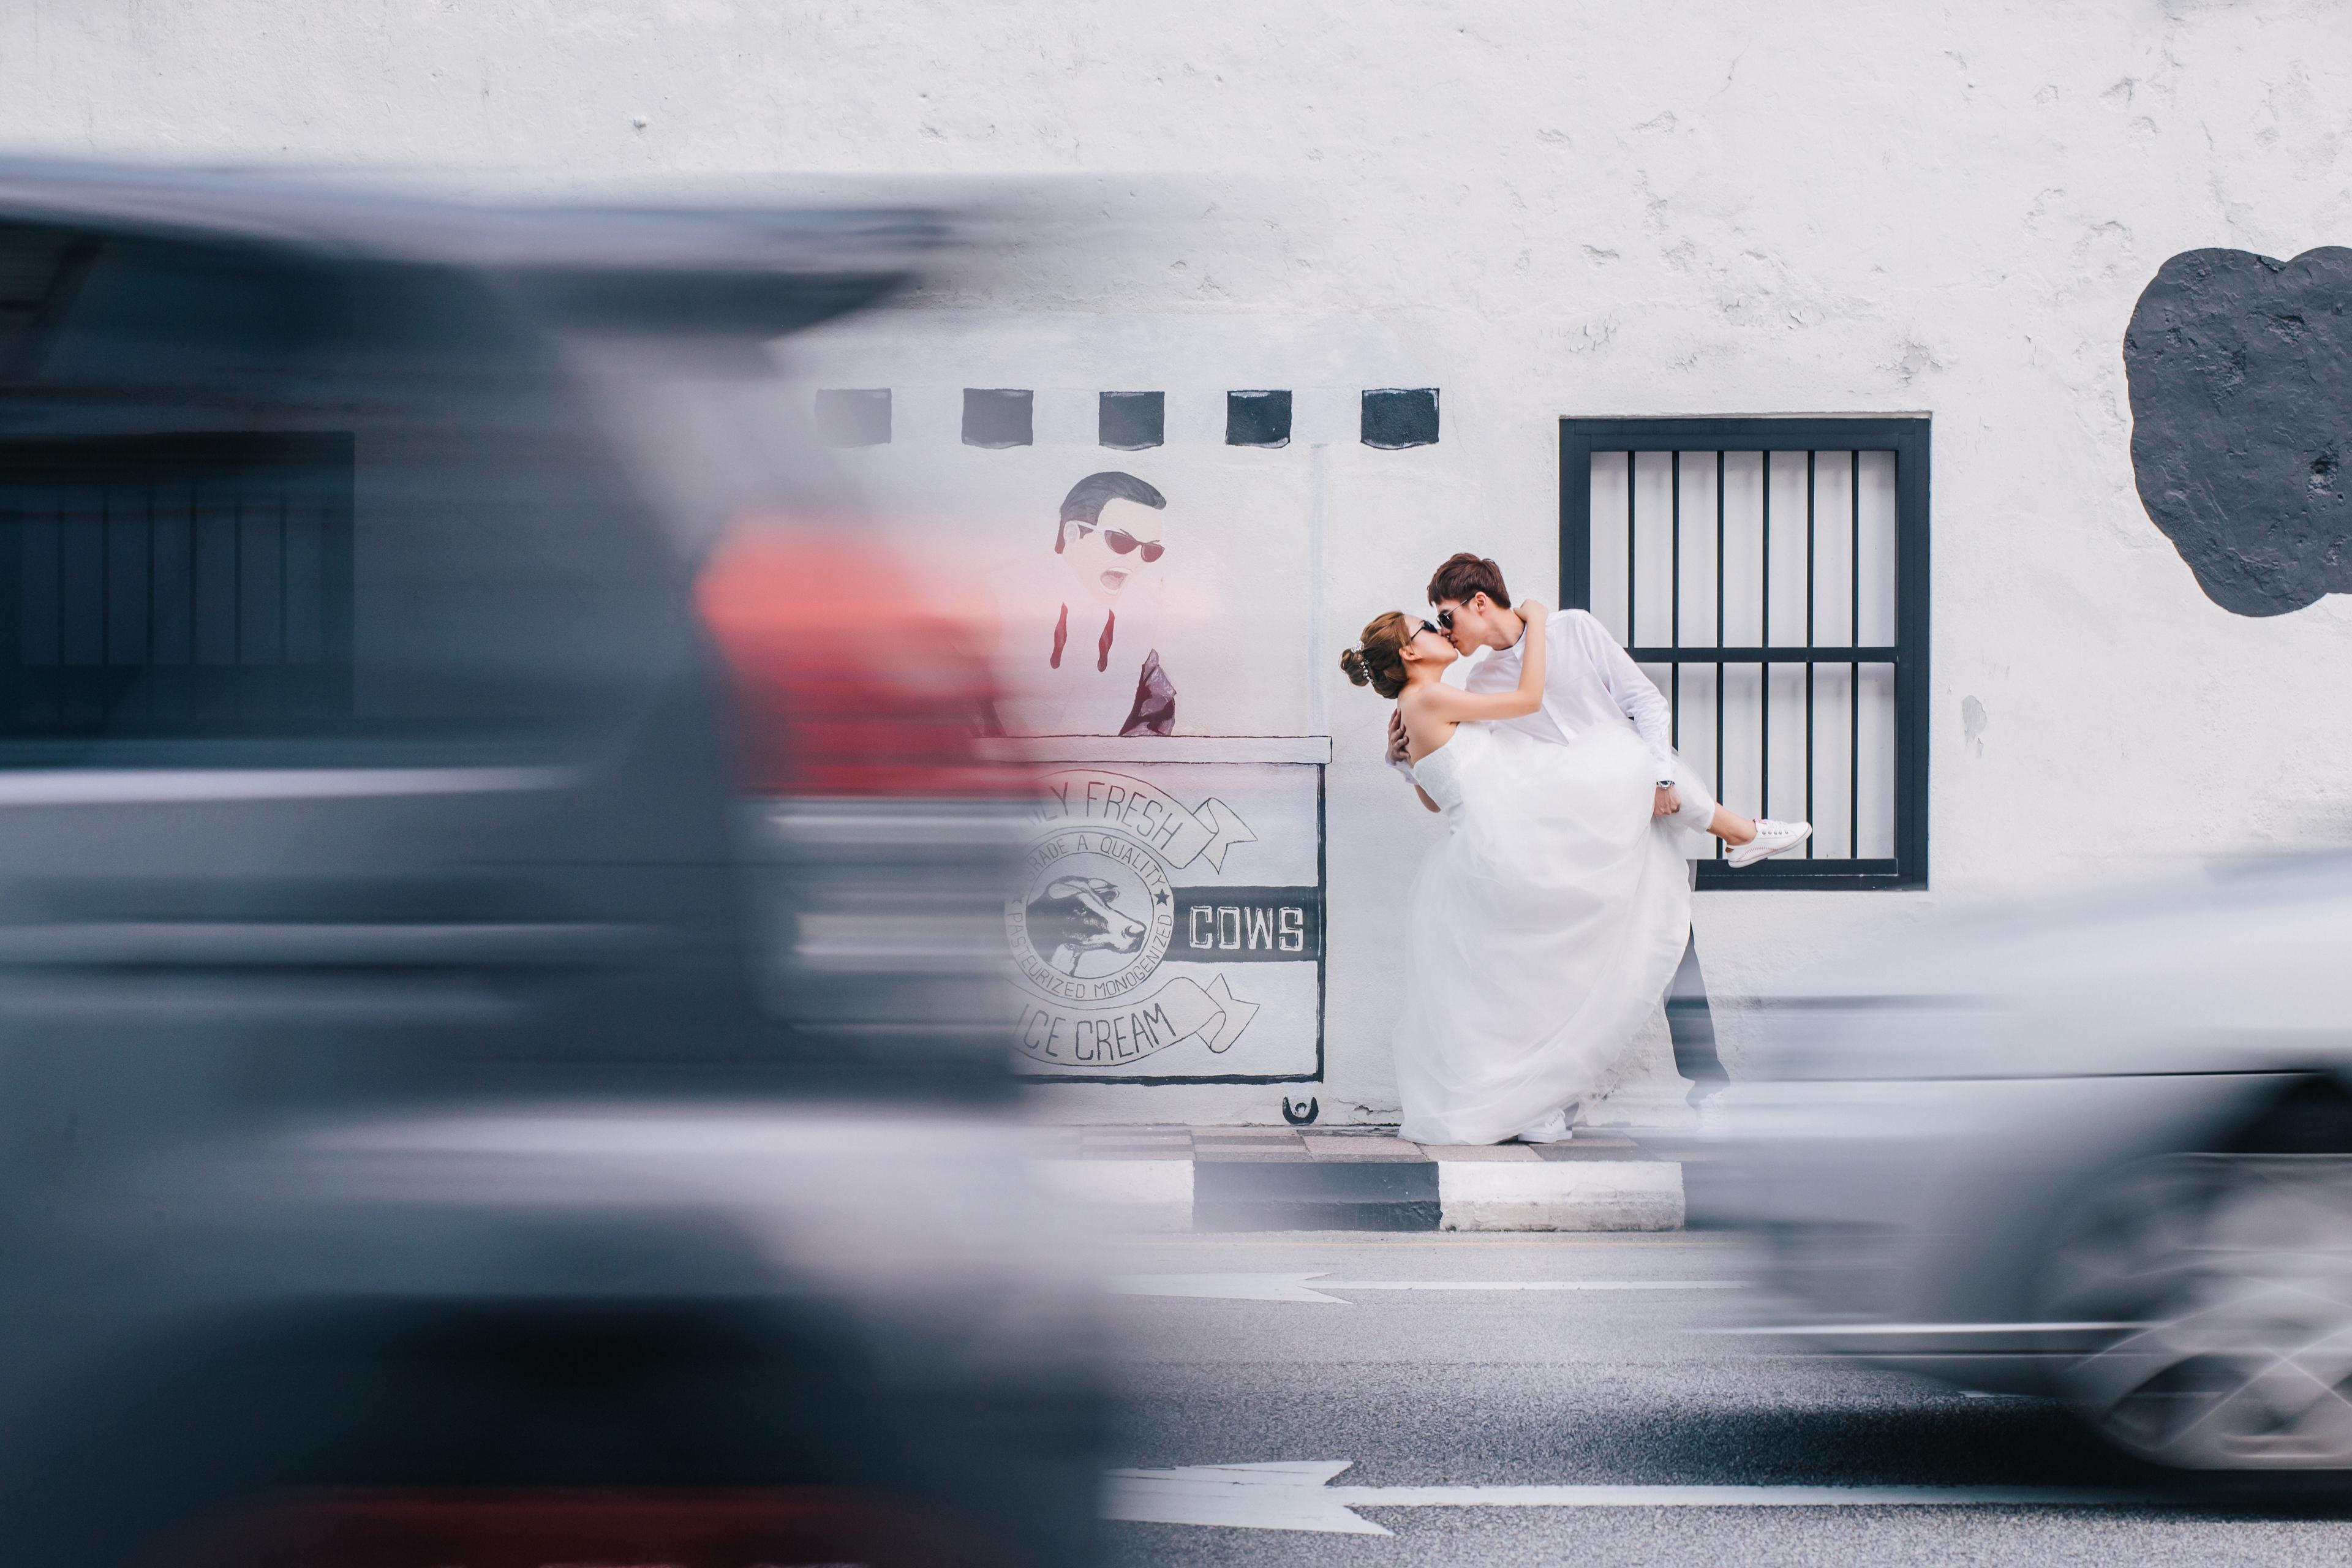 Pre Wedding in Concubine Lane Ipoh, 怡保二奶巷 Perak Malaysia